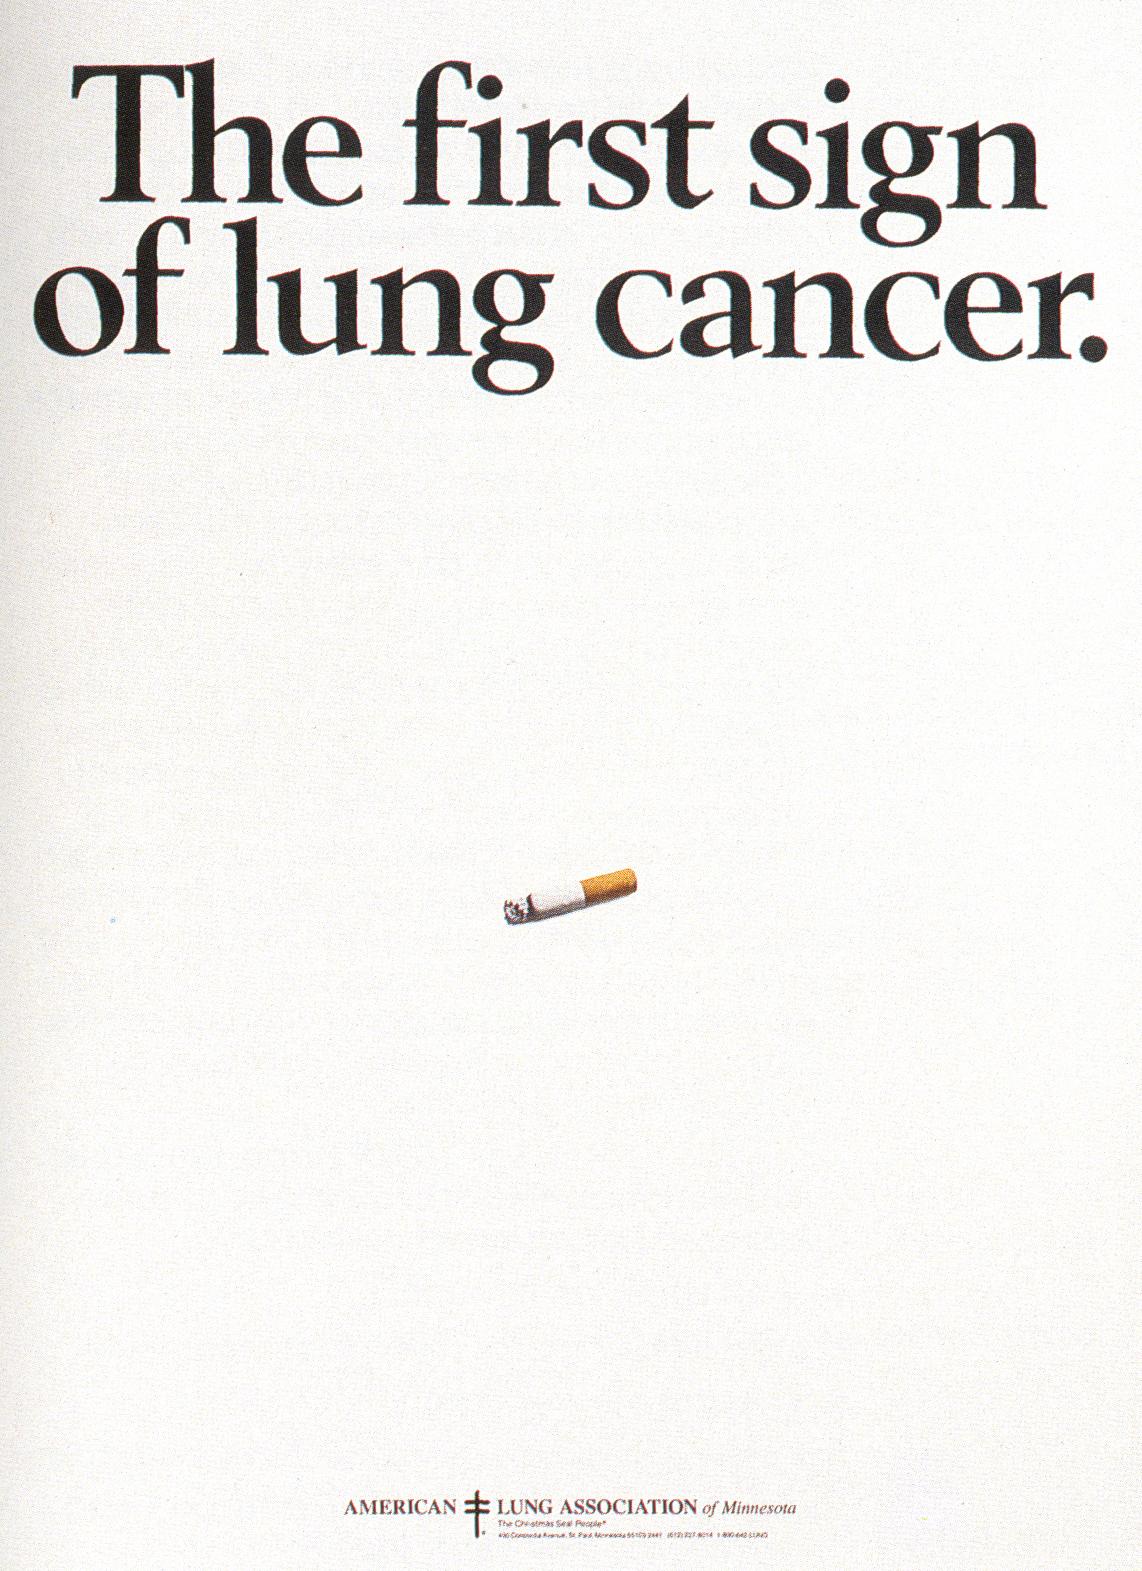 Fallon McElligott, Anti Smoking 'First Sign'-01